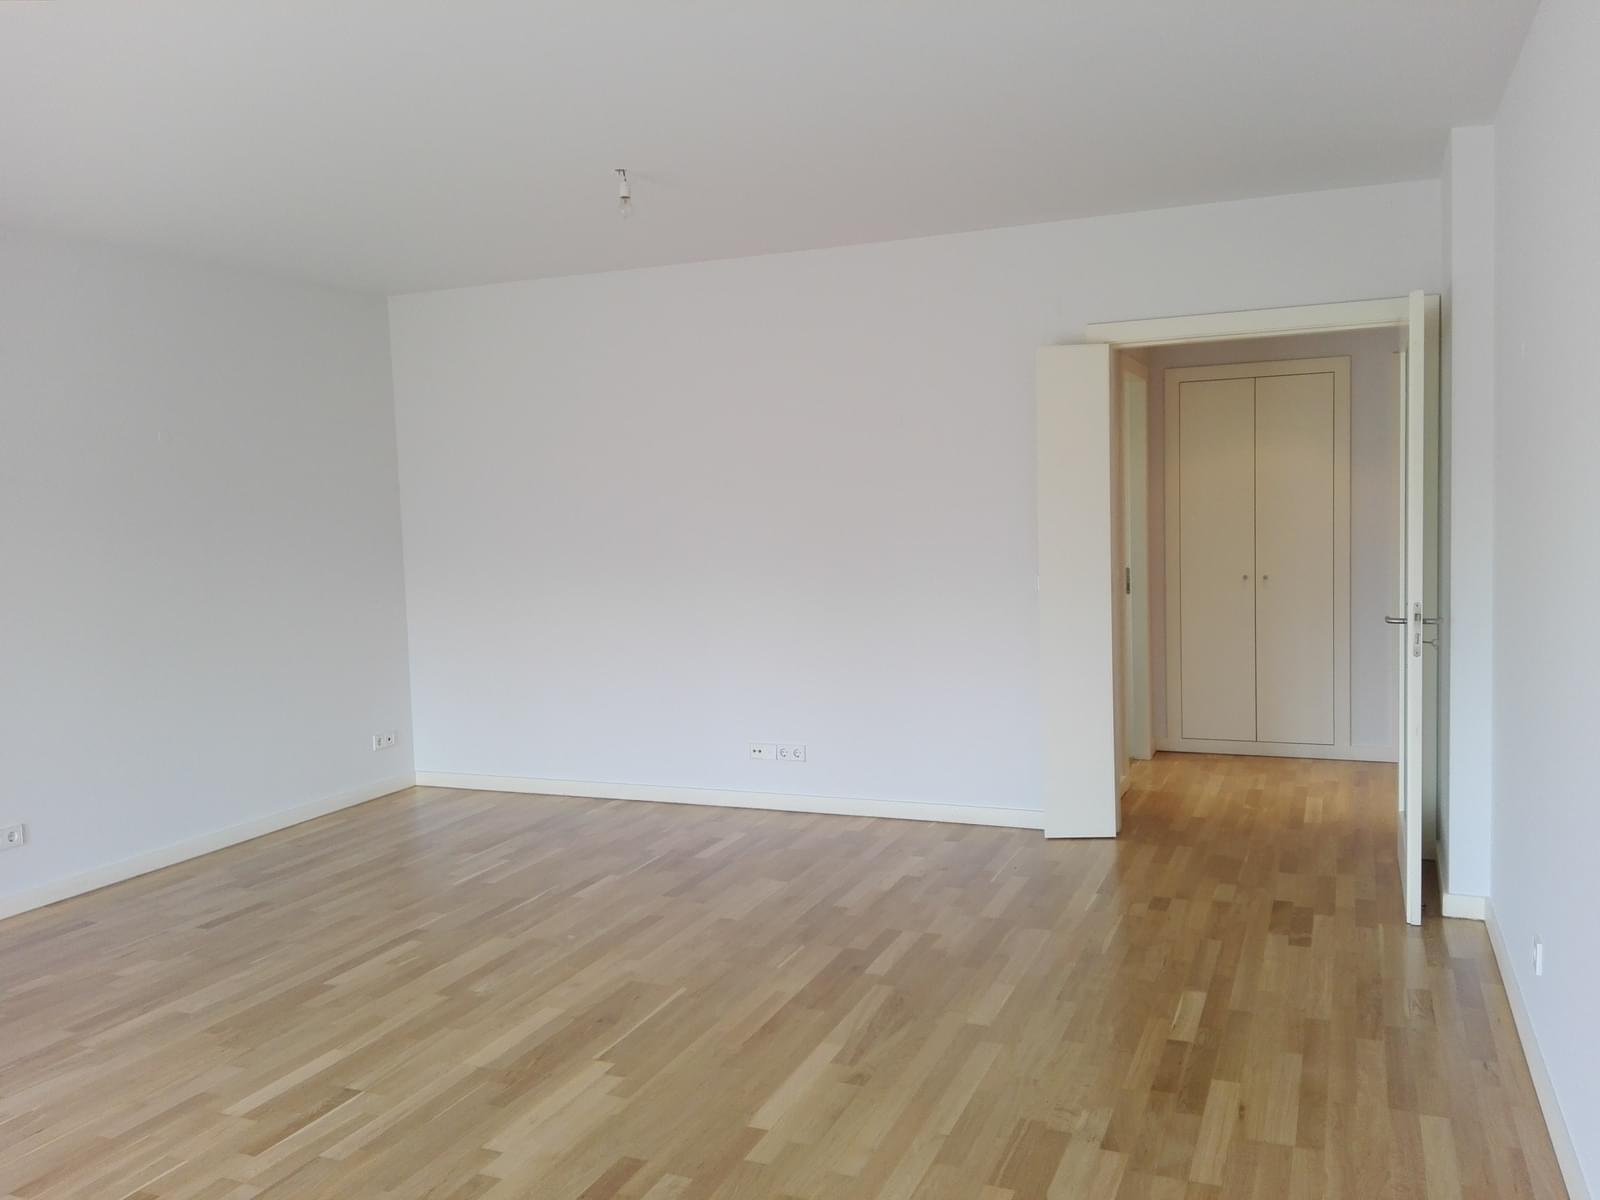 pf18814-apartamento-t2-lisboa-2627a424-9846-4bf3-a332-01e4bd6e93b7